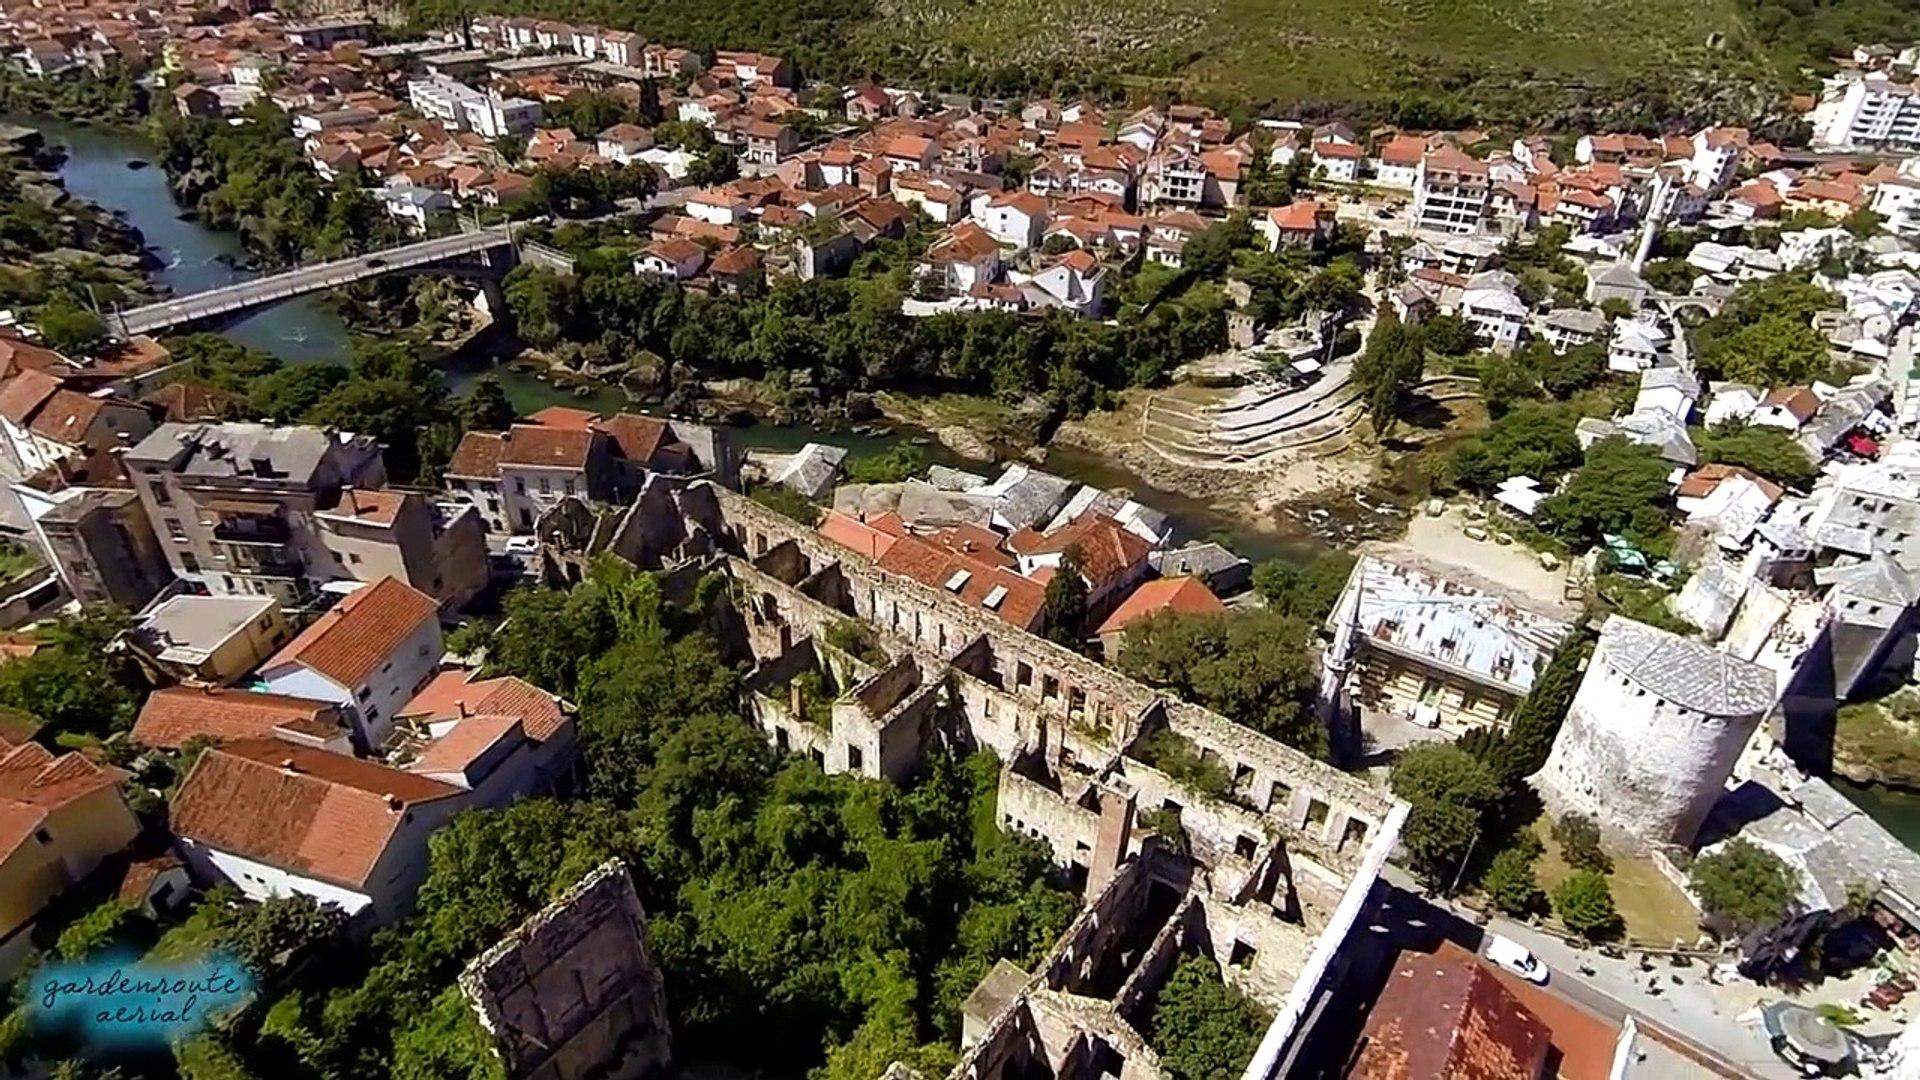 Flying over Mostar (Bosnia and Herzegovina)